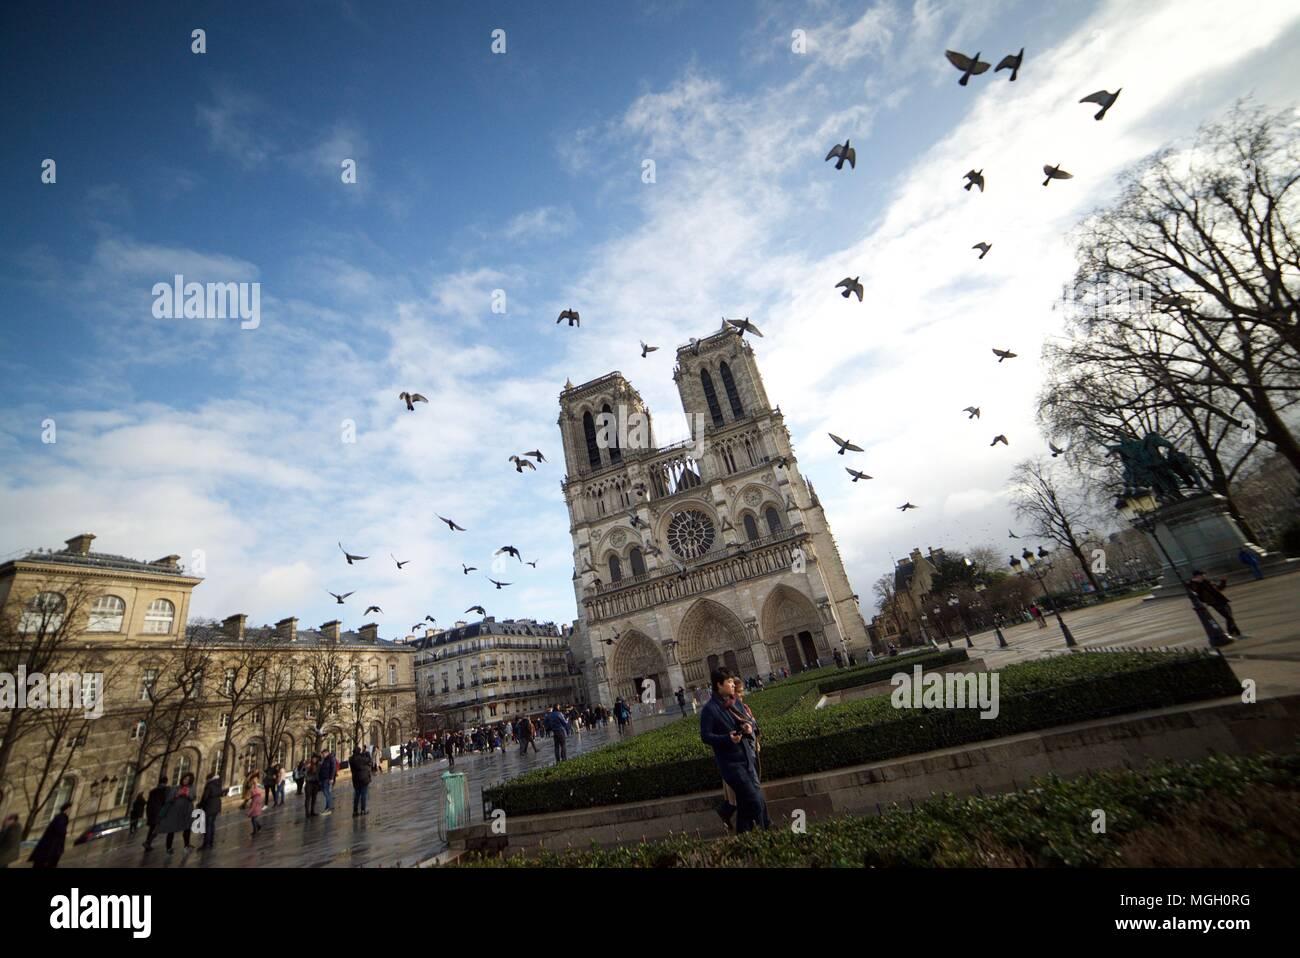 Pigeons flying past the Notre Dame Cathedral in Paris (Notre-Dame de Paris) - Stock Image